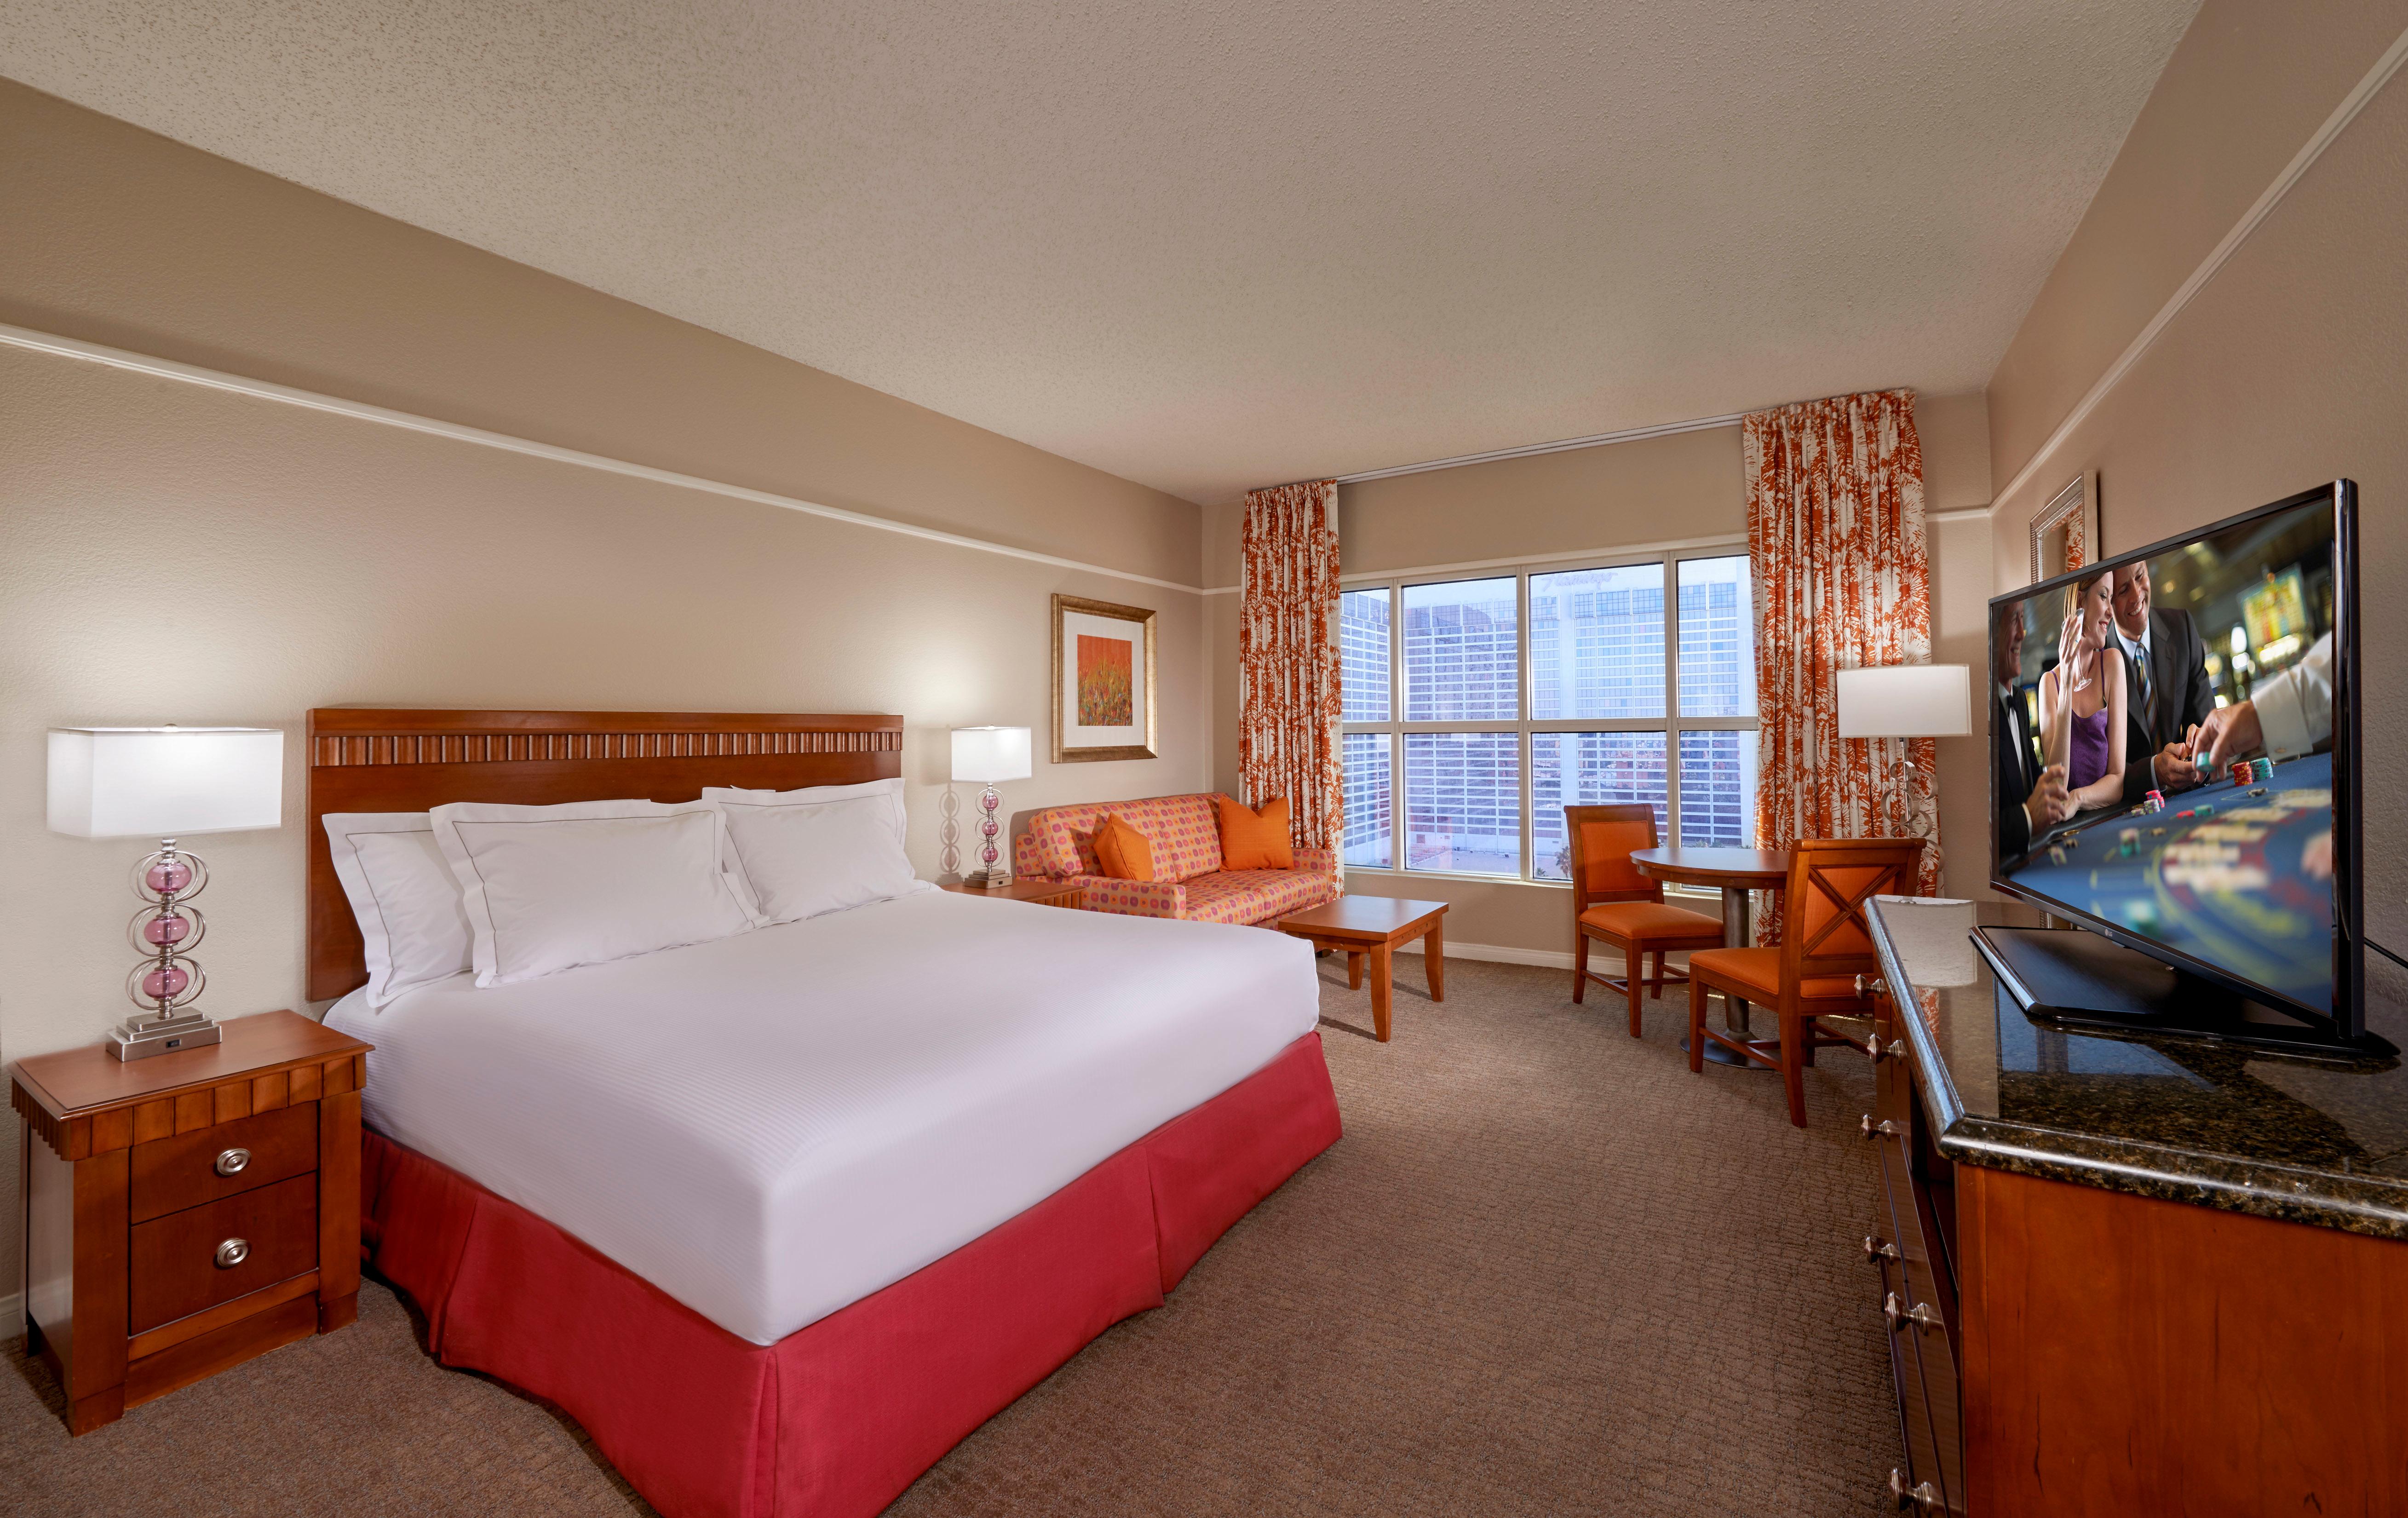 Hilton Grand Vacations At The Flamingo Las Vegas Nevada